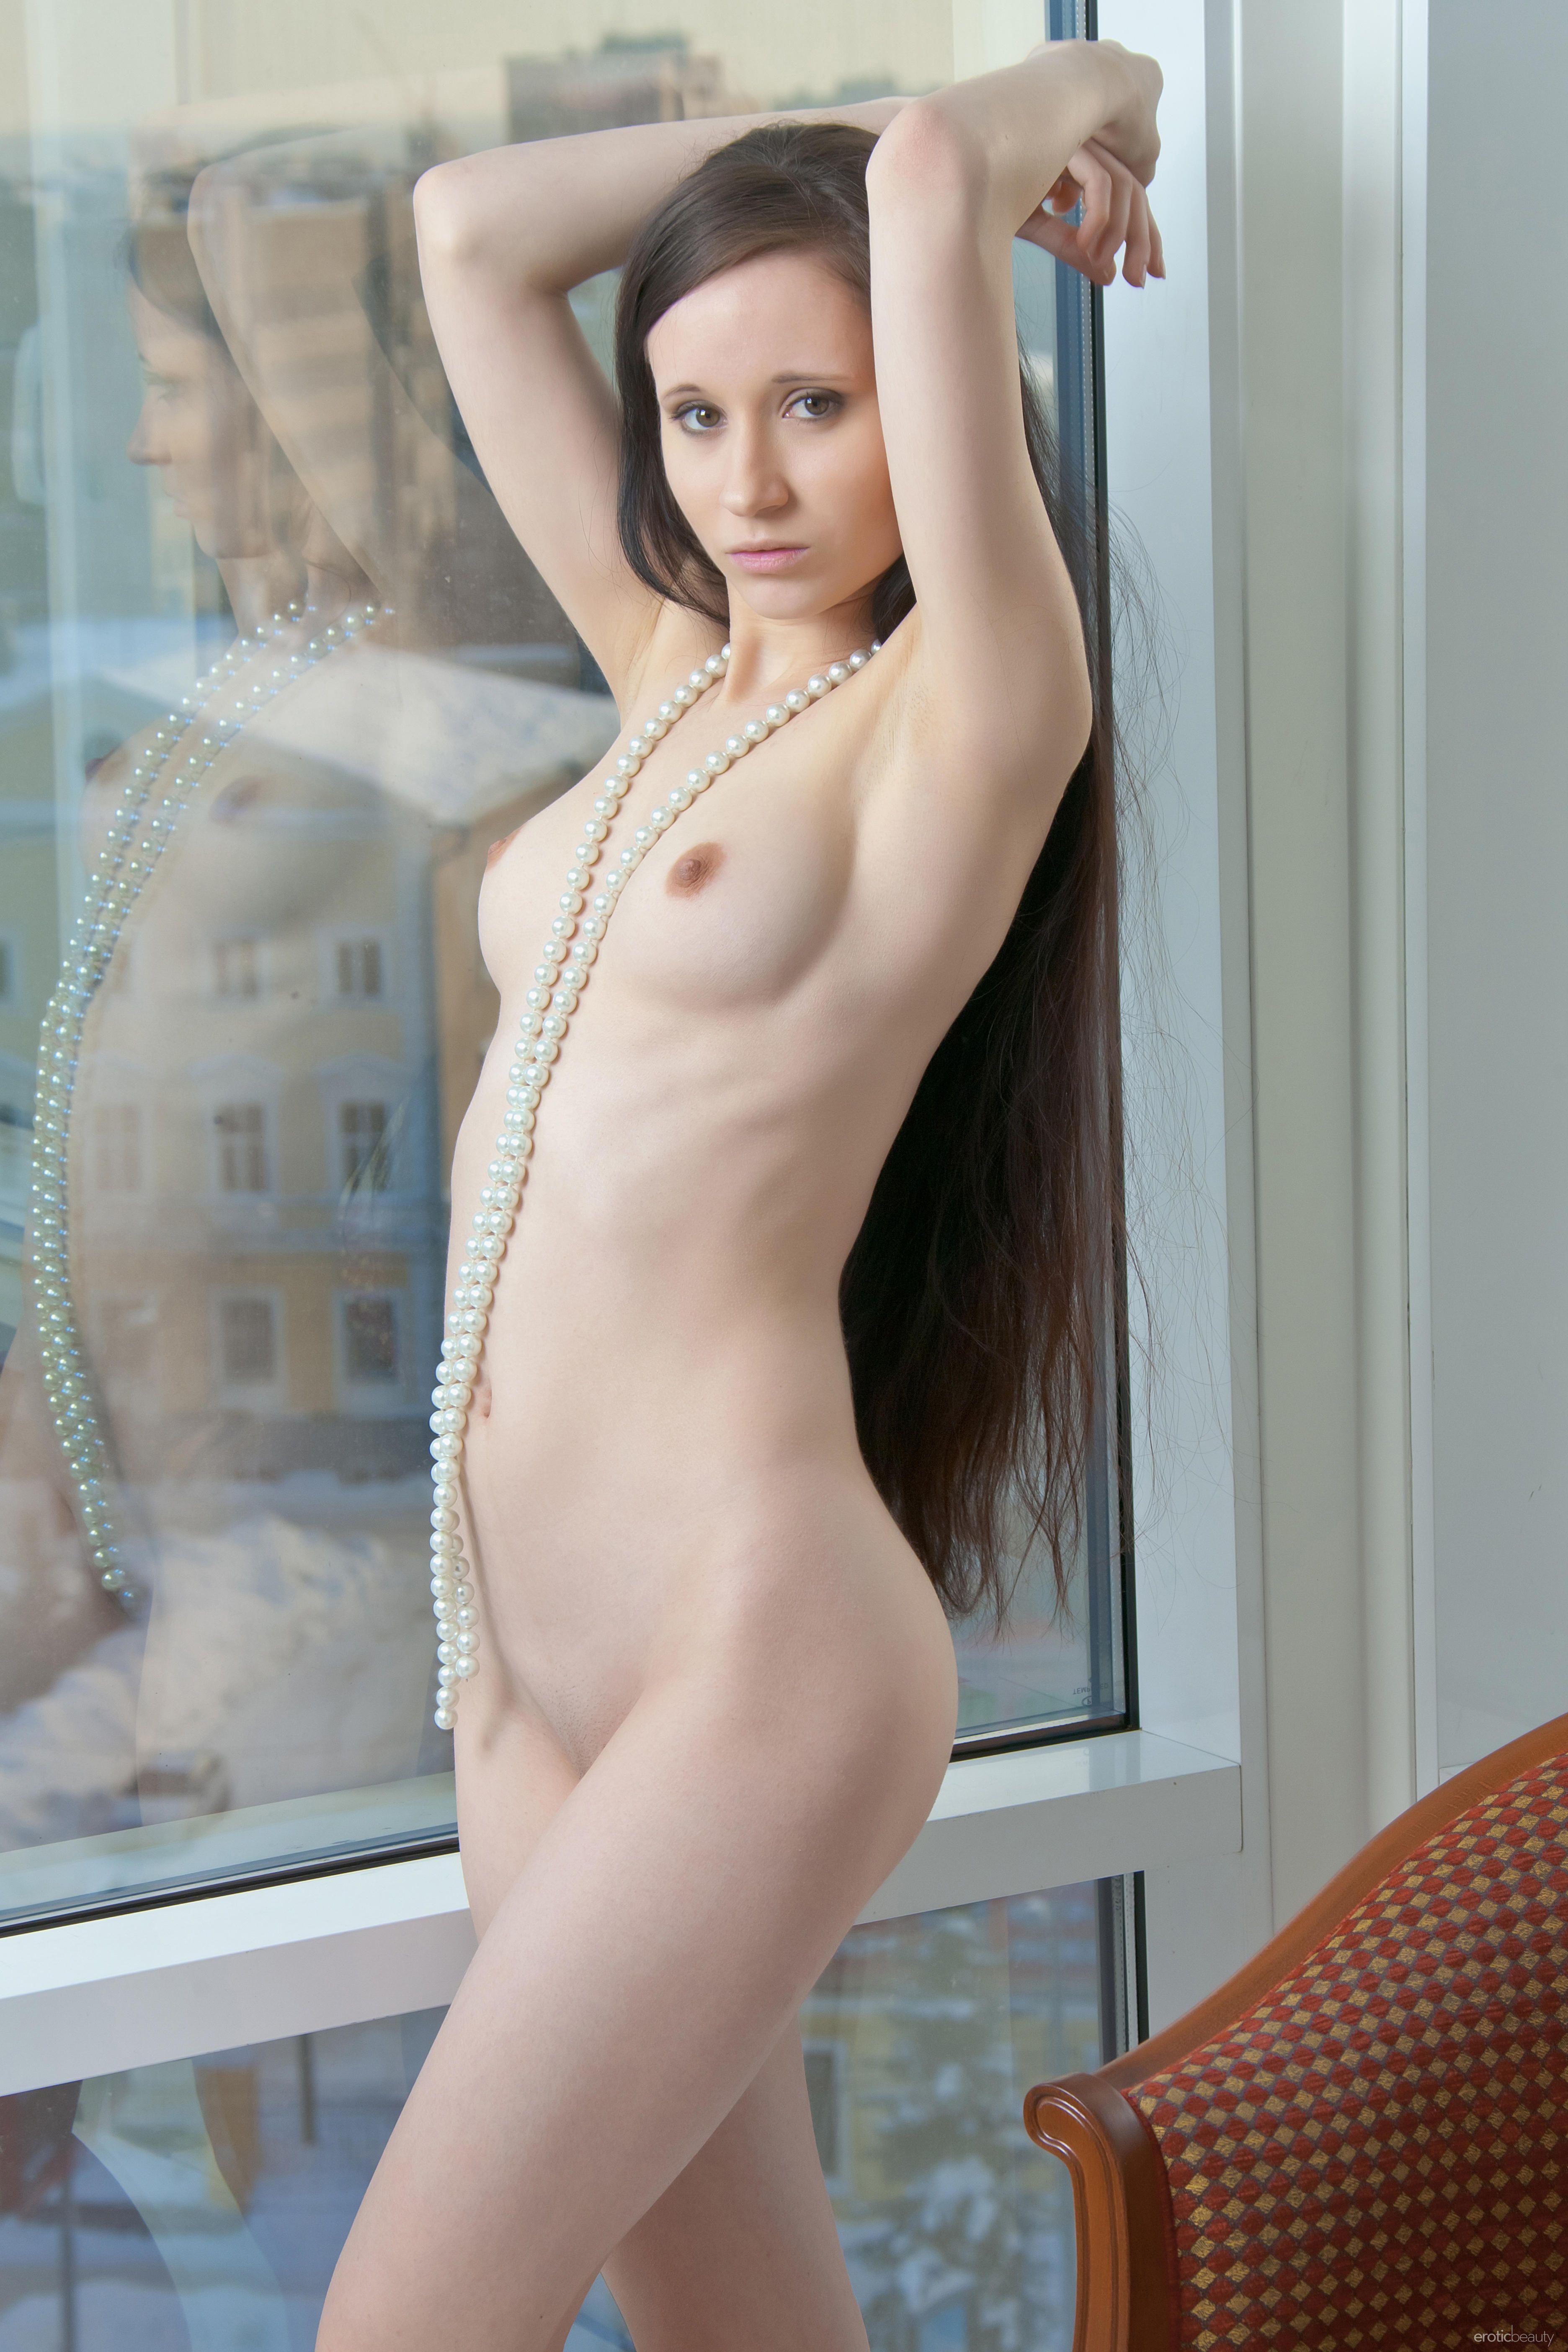 http://i3.imageban.ru/out/2013/07/18/d879f061b2161e0628995e0c5f7cfcee.jpg